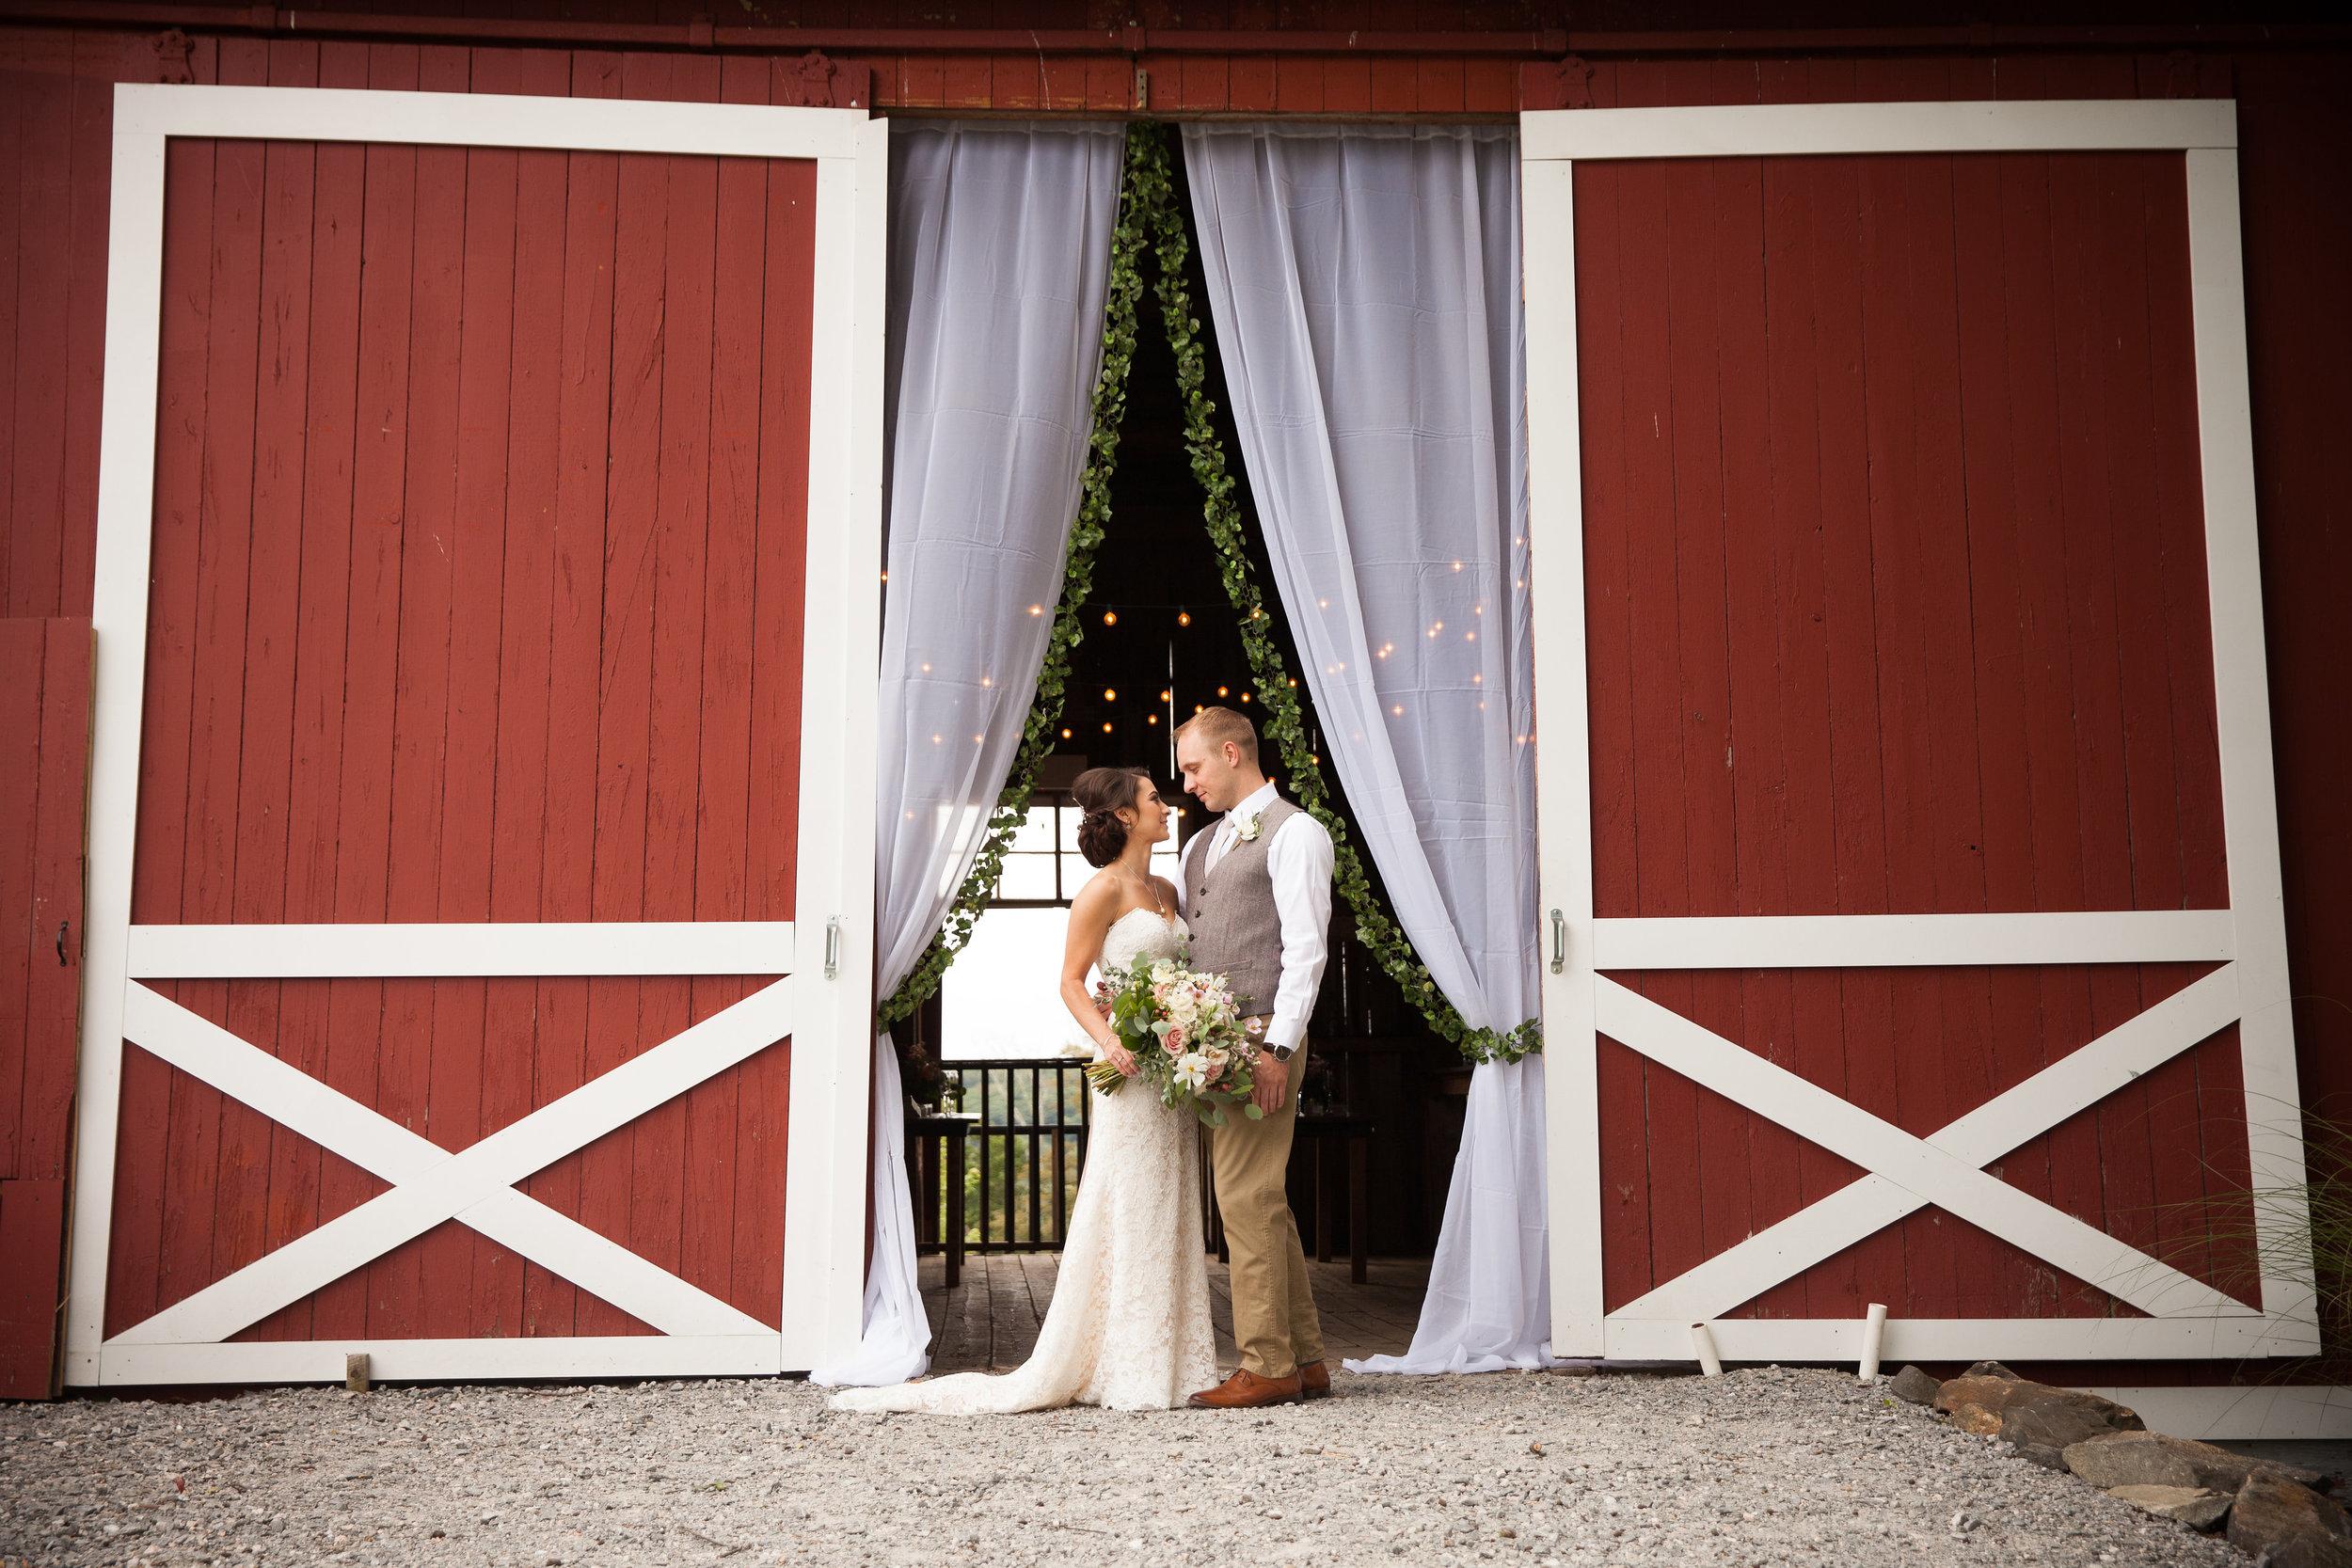 Barn Weddings - Pearl Weddings and Events